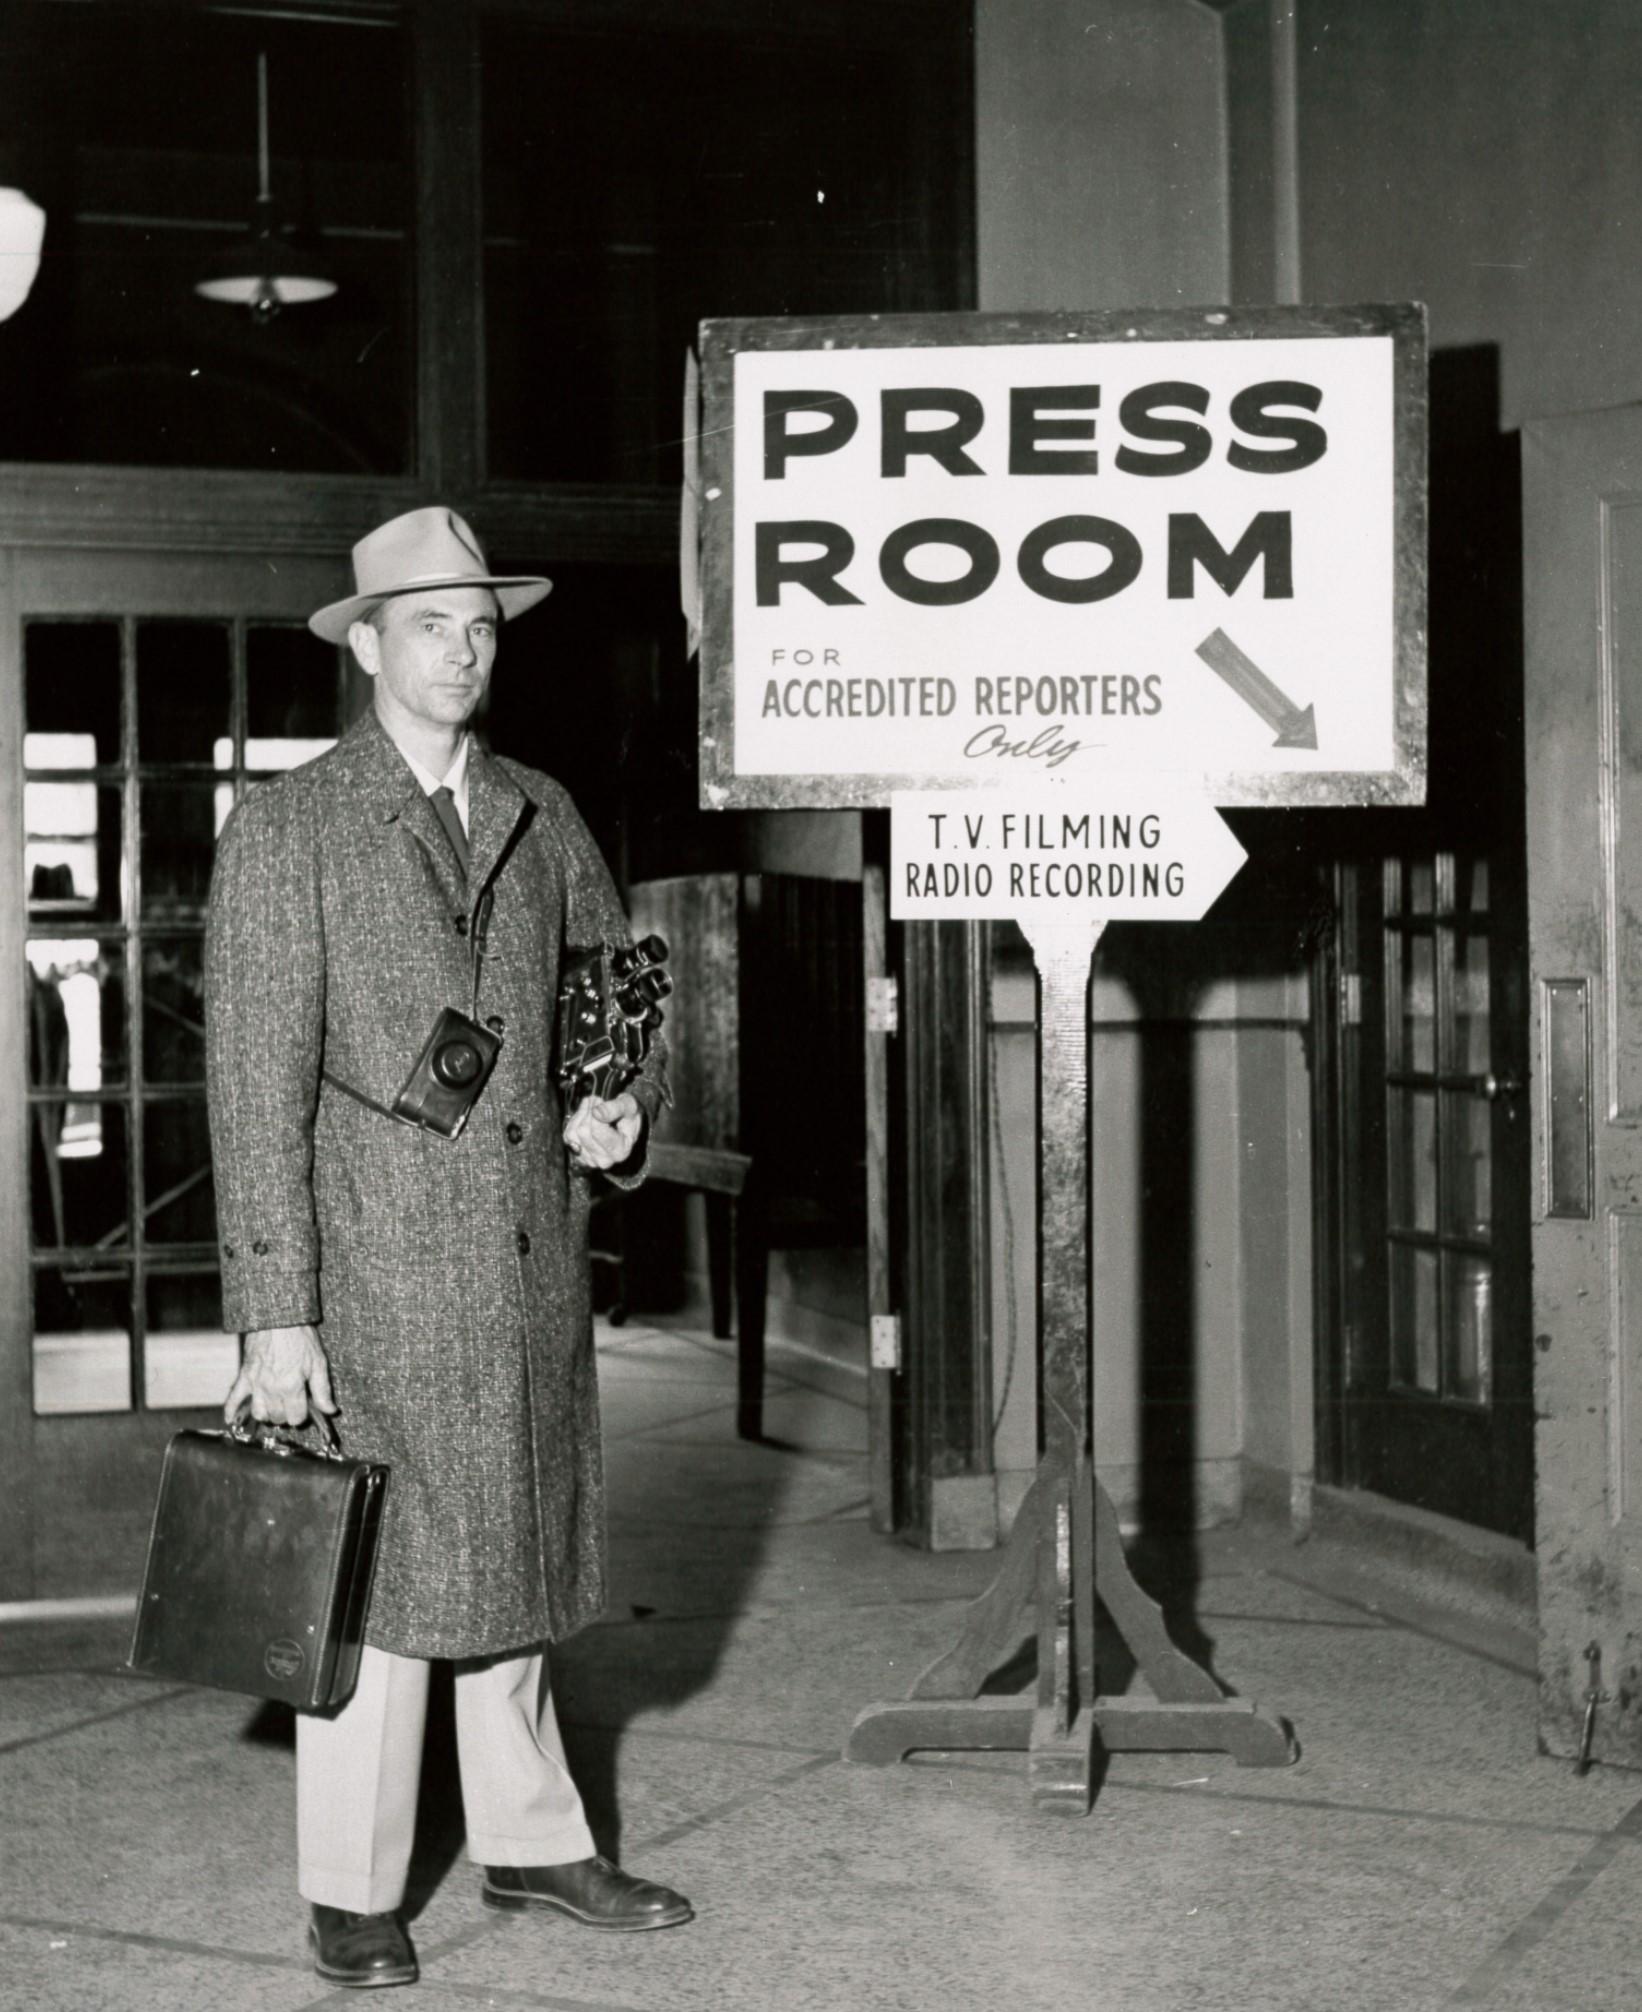 1950s Press Room